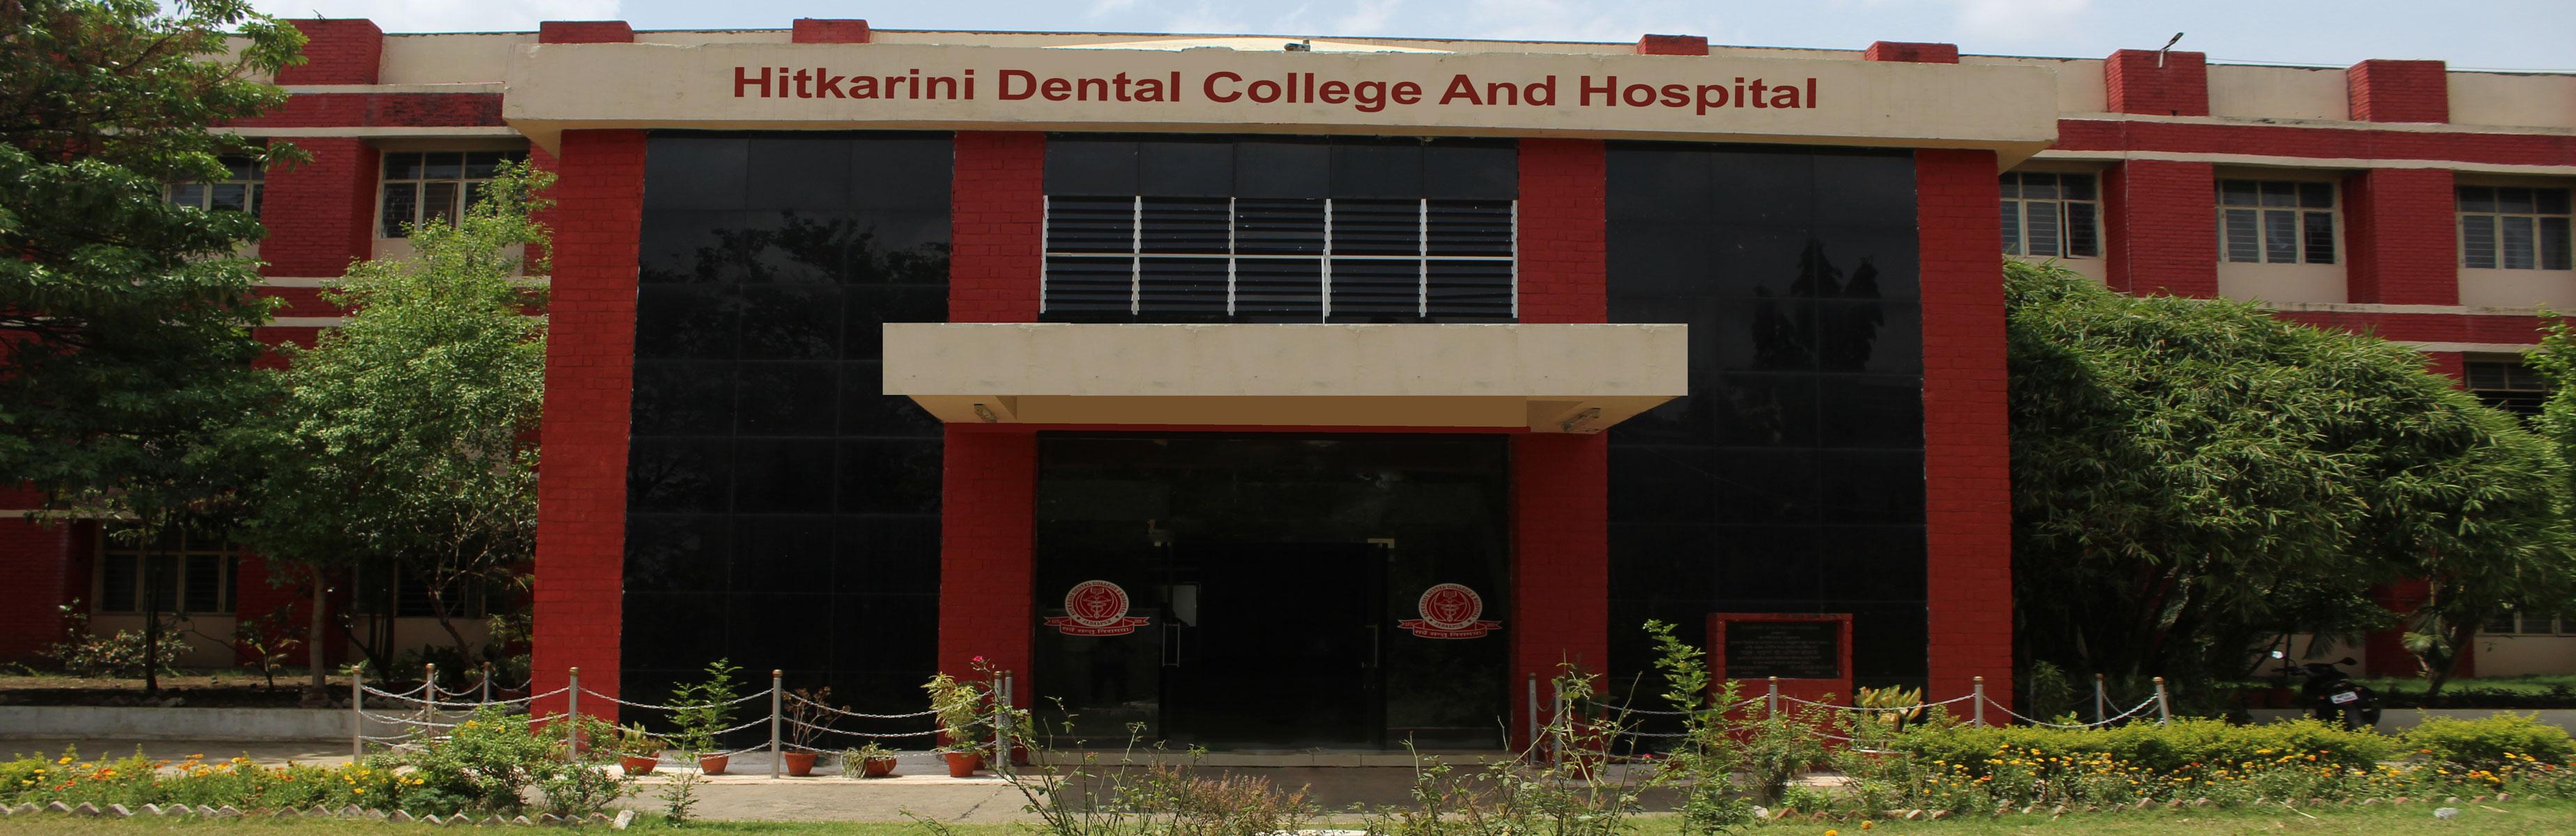 Hitkarini Dental College and Hospital, Jabalpur Image